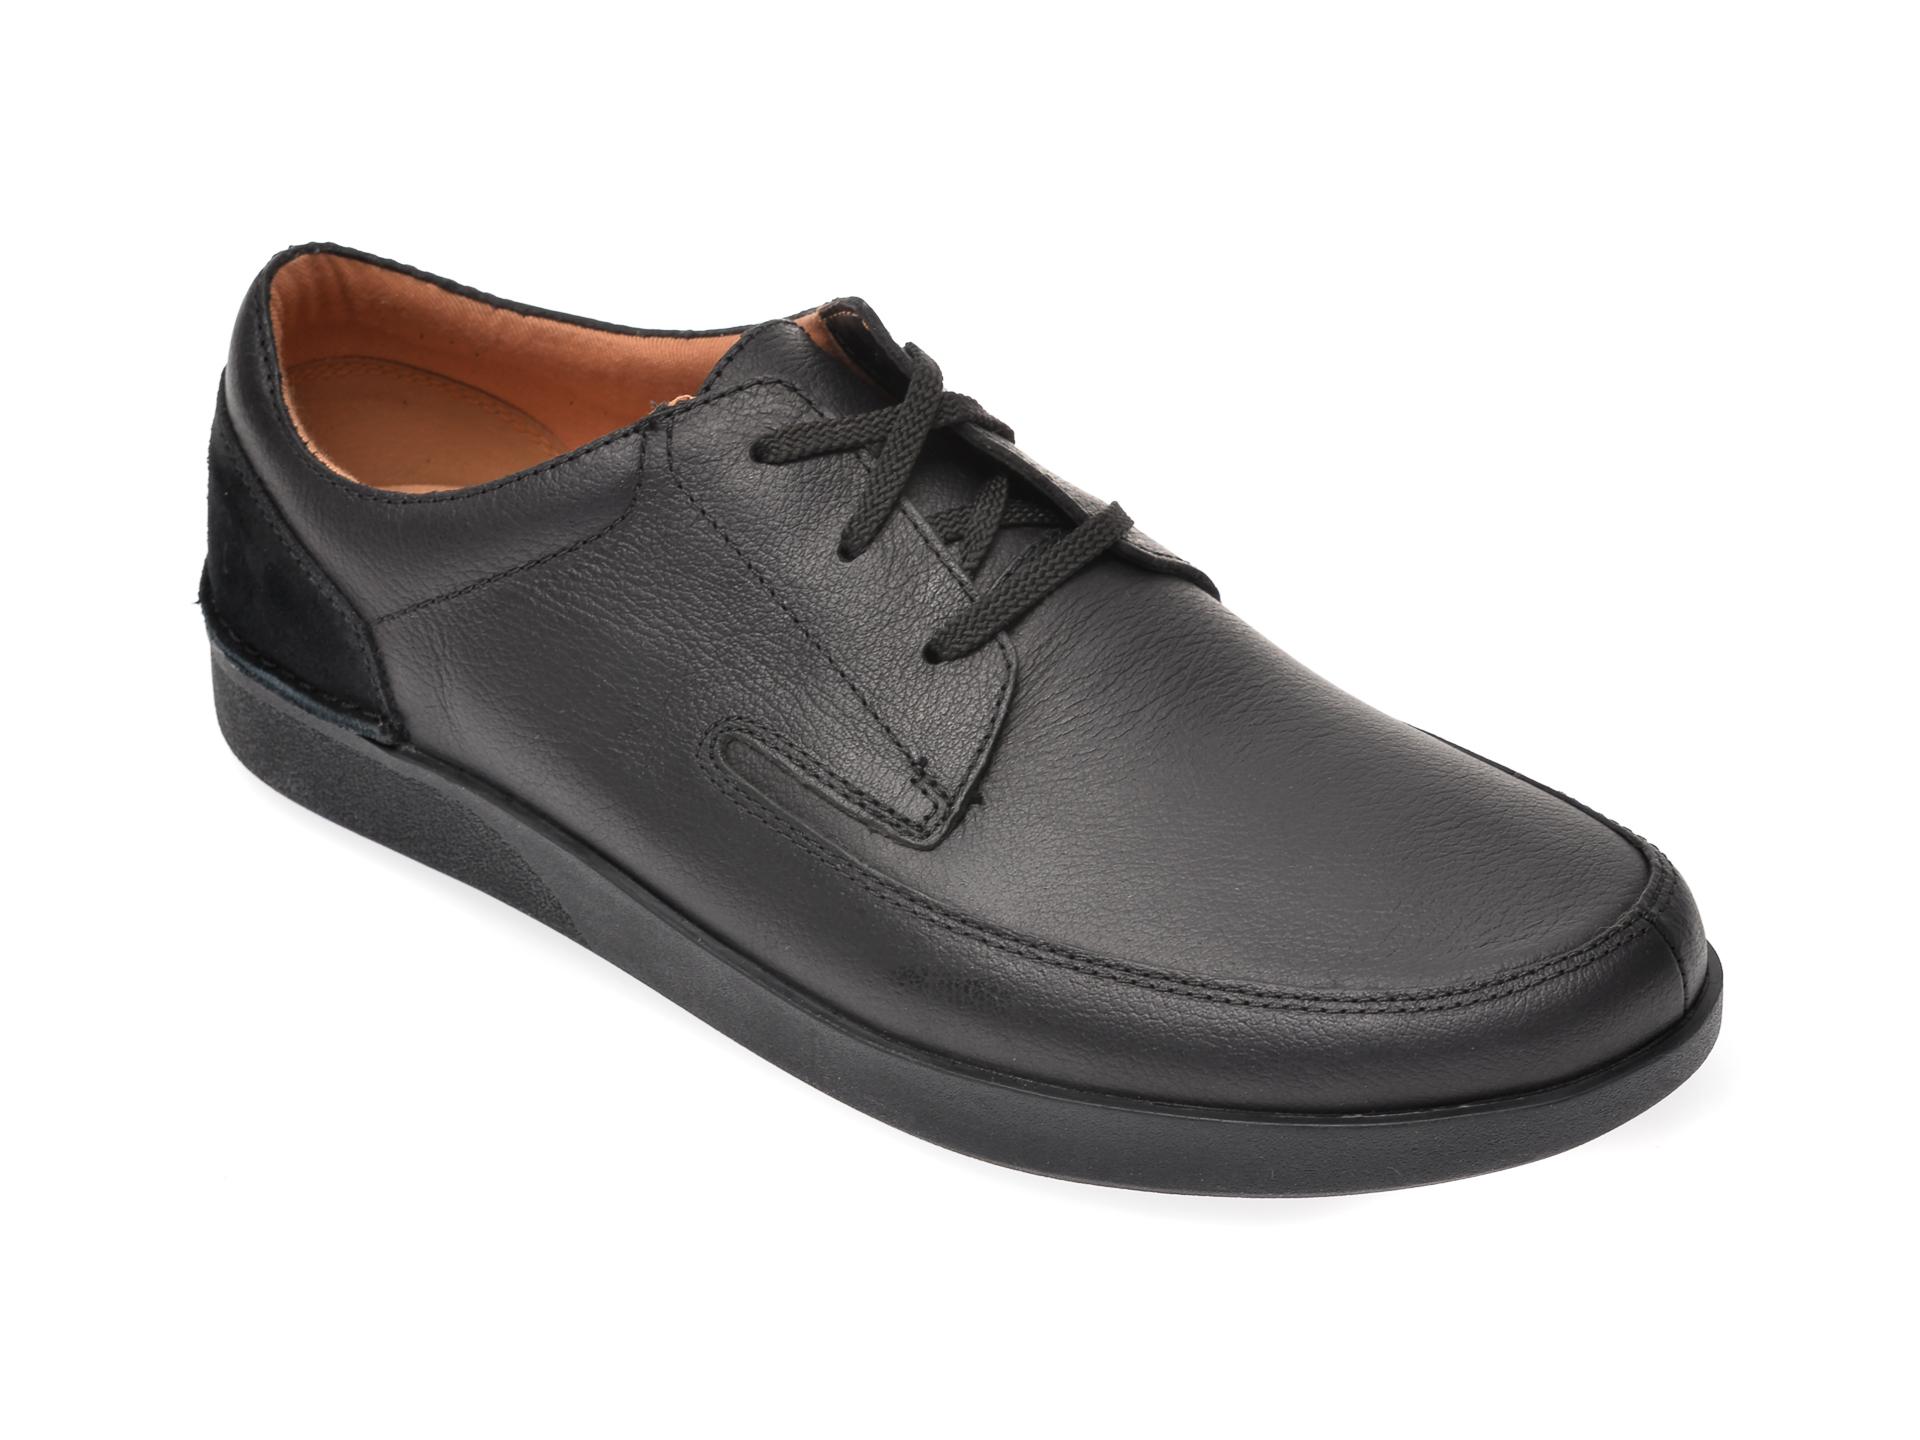 Pantofi Clarks Negri, Oakland Craft, Din Piele Naturala